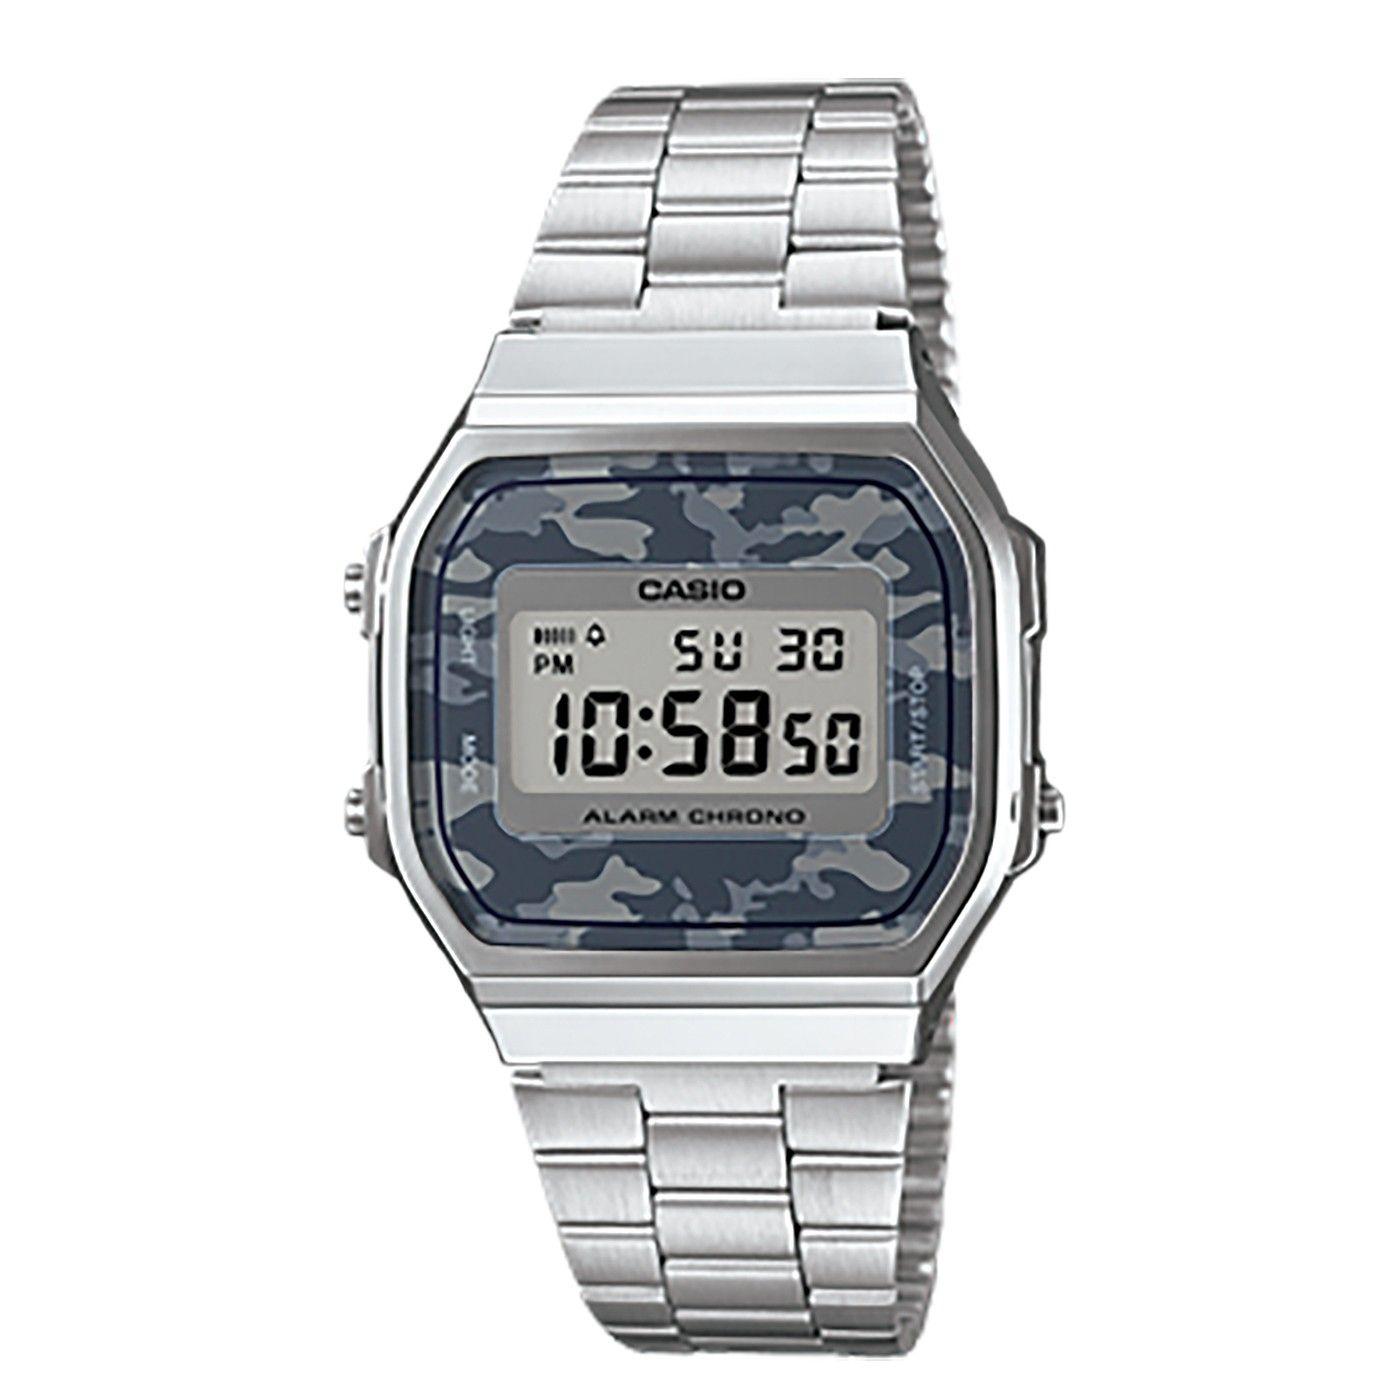 25b3b9aa6f07 Casio A168WEC-1EF Watch in Chrome   Camo